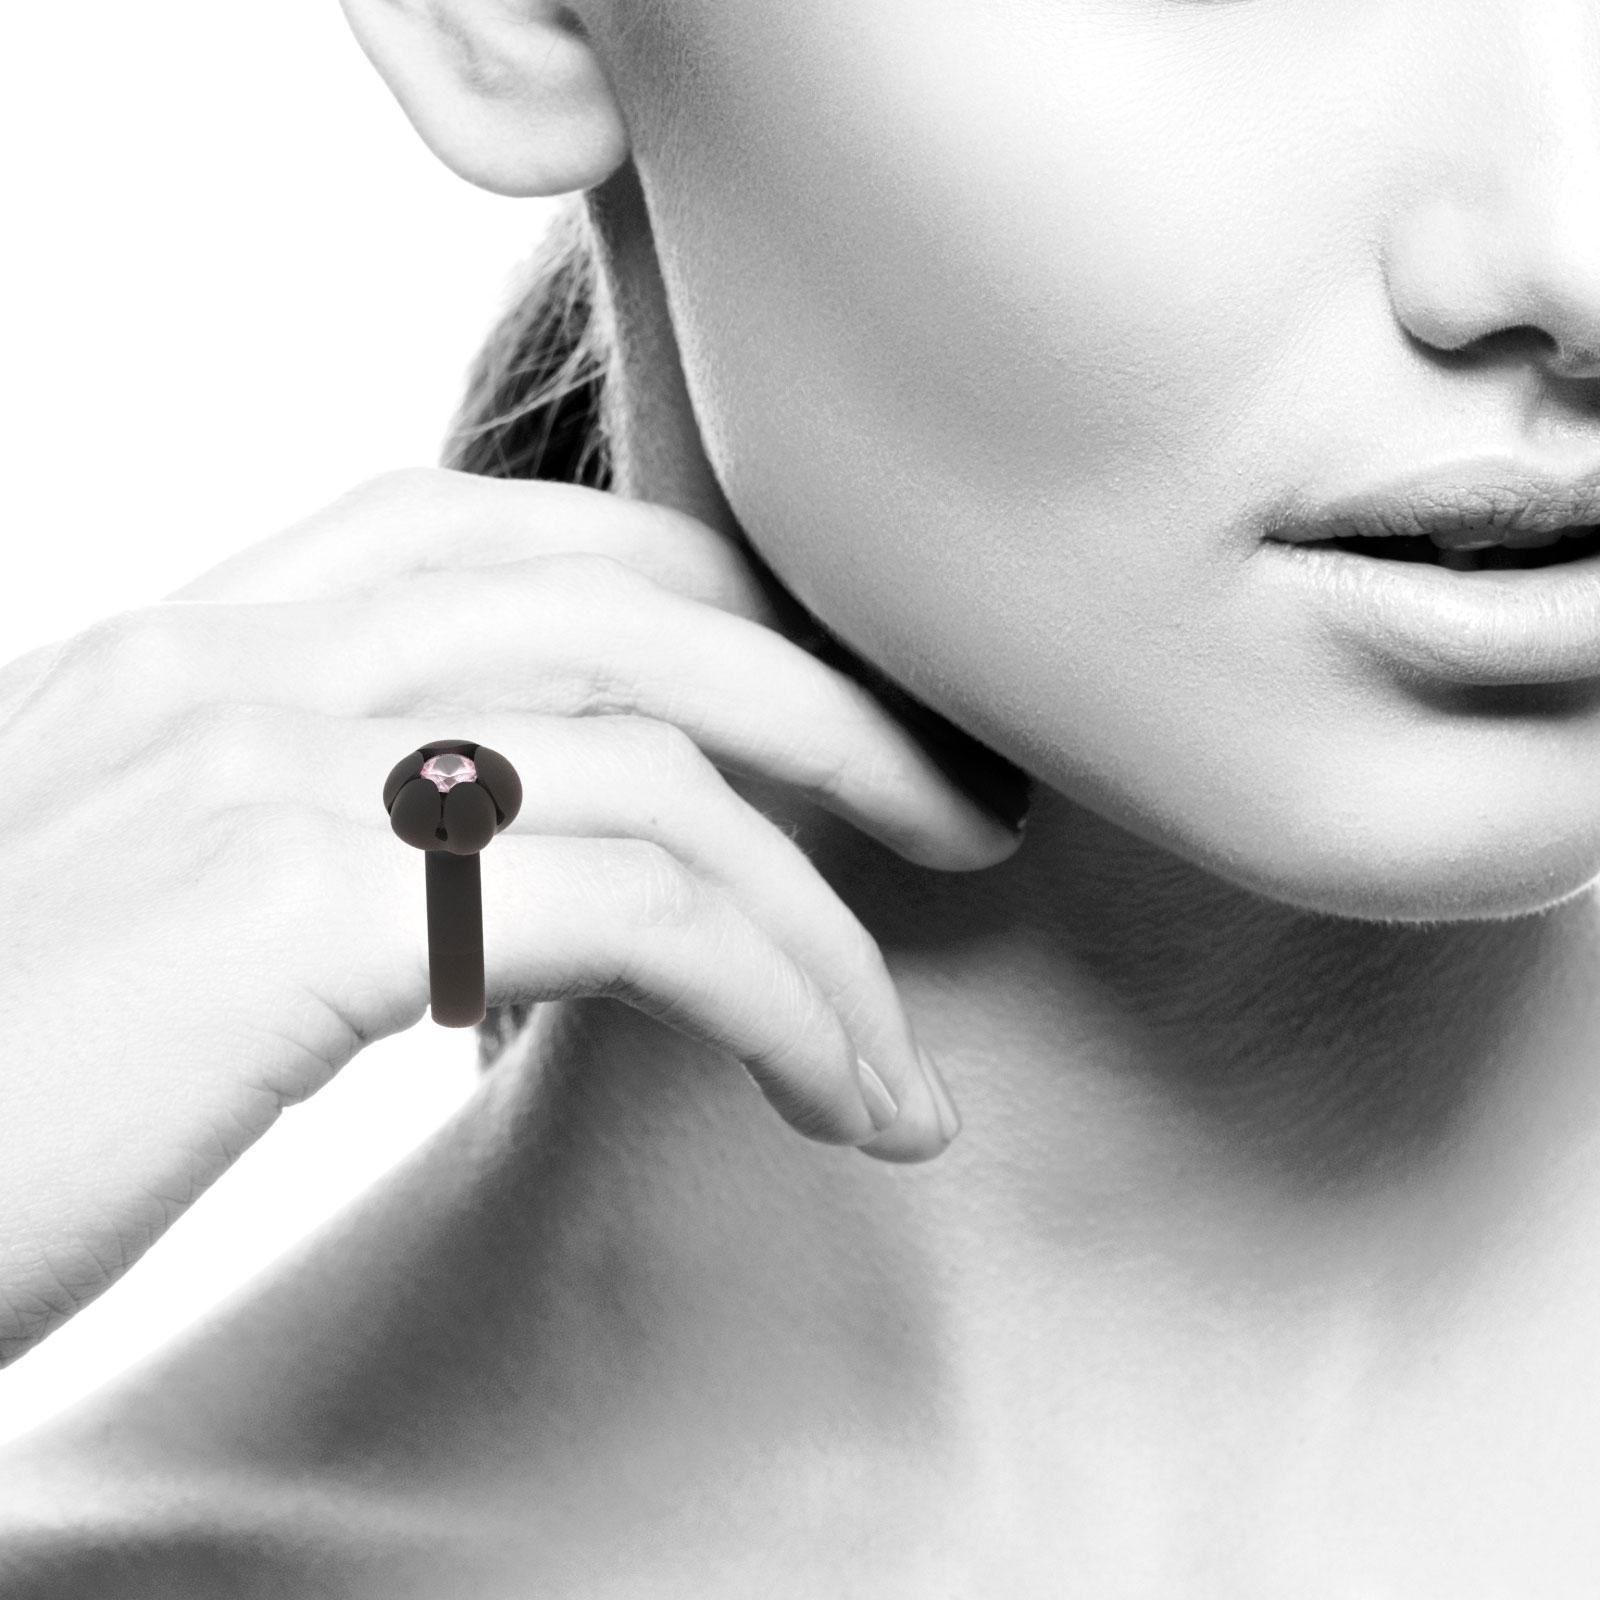 Bud Ring, 6mm Topaz